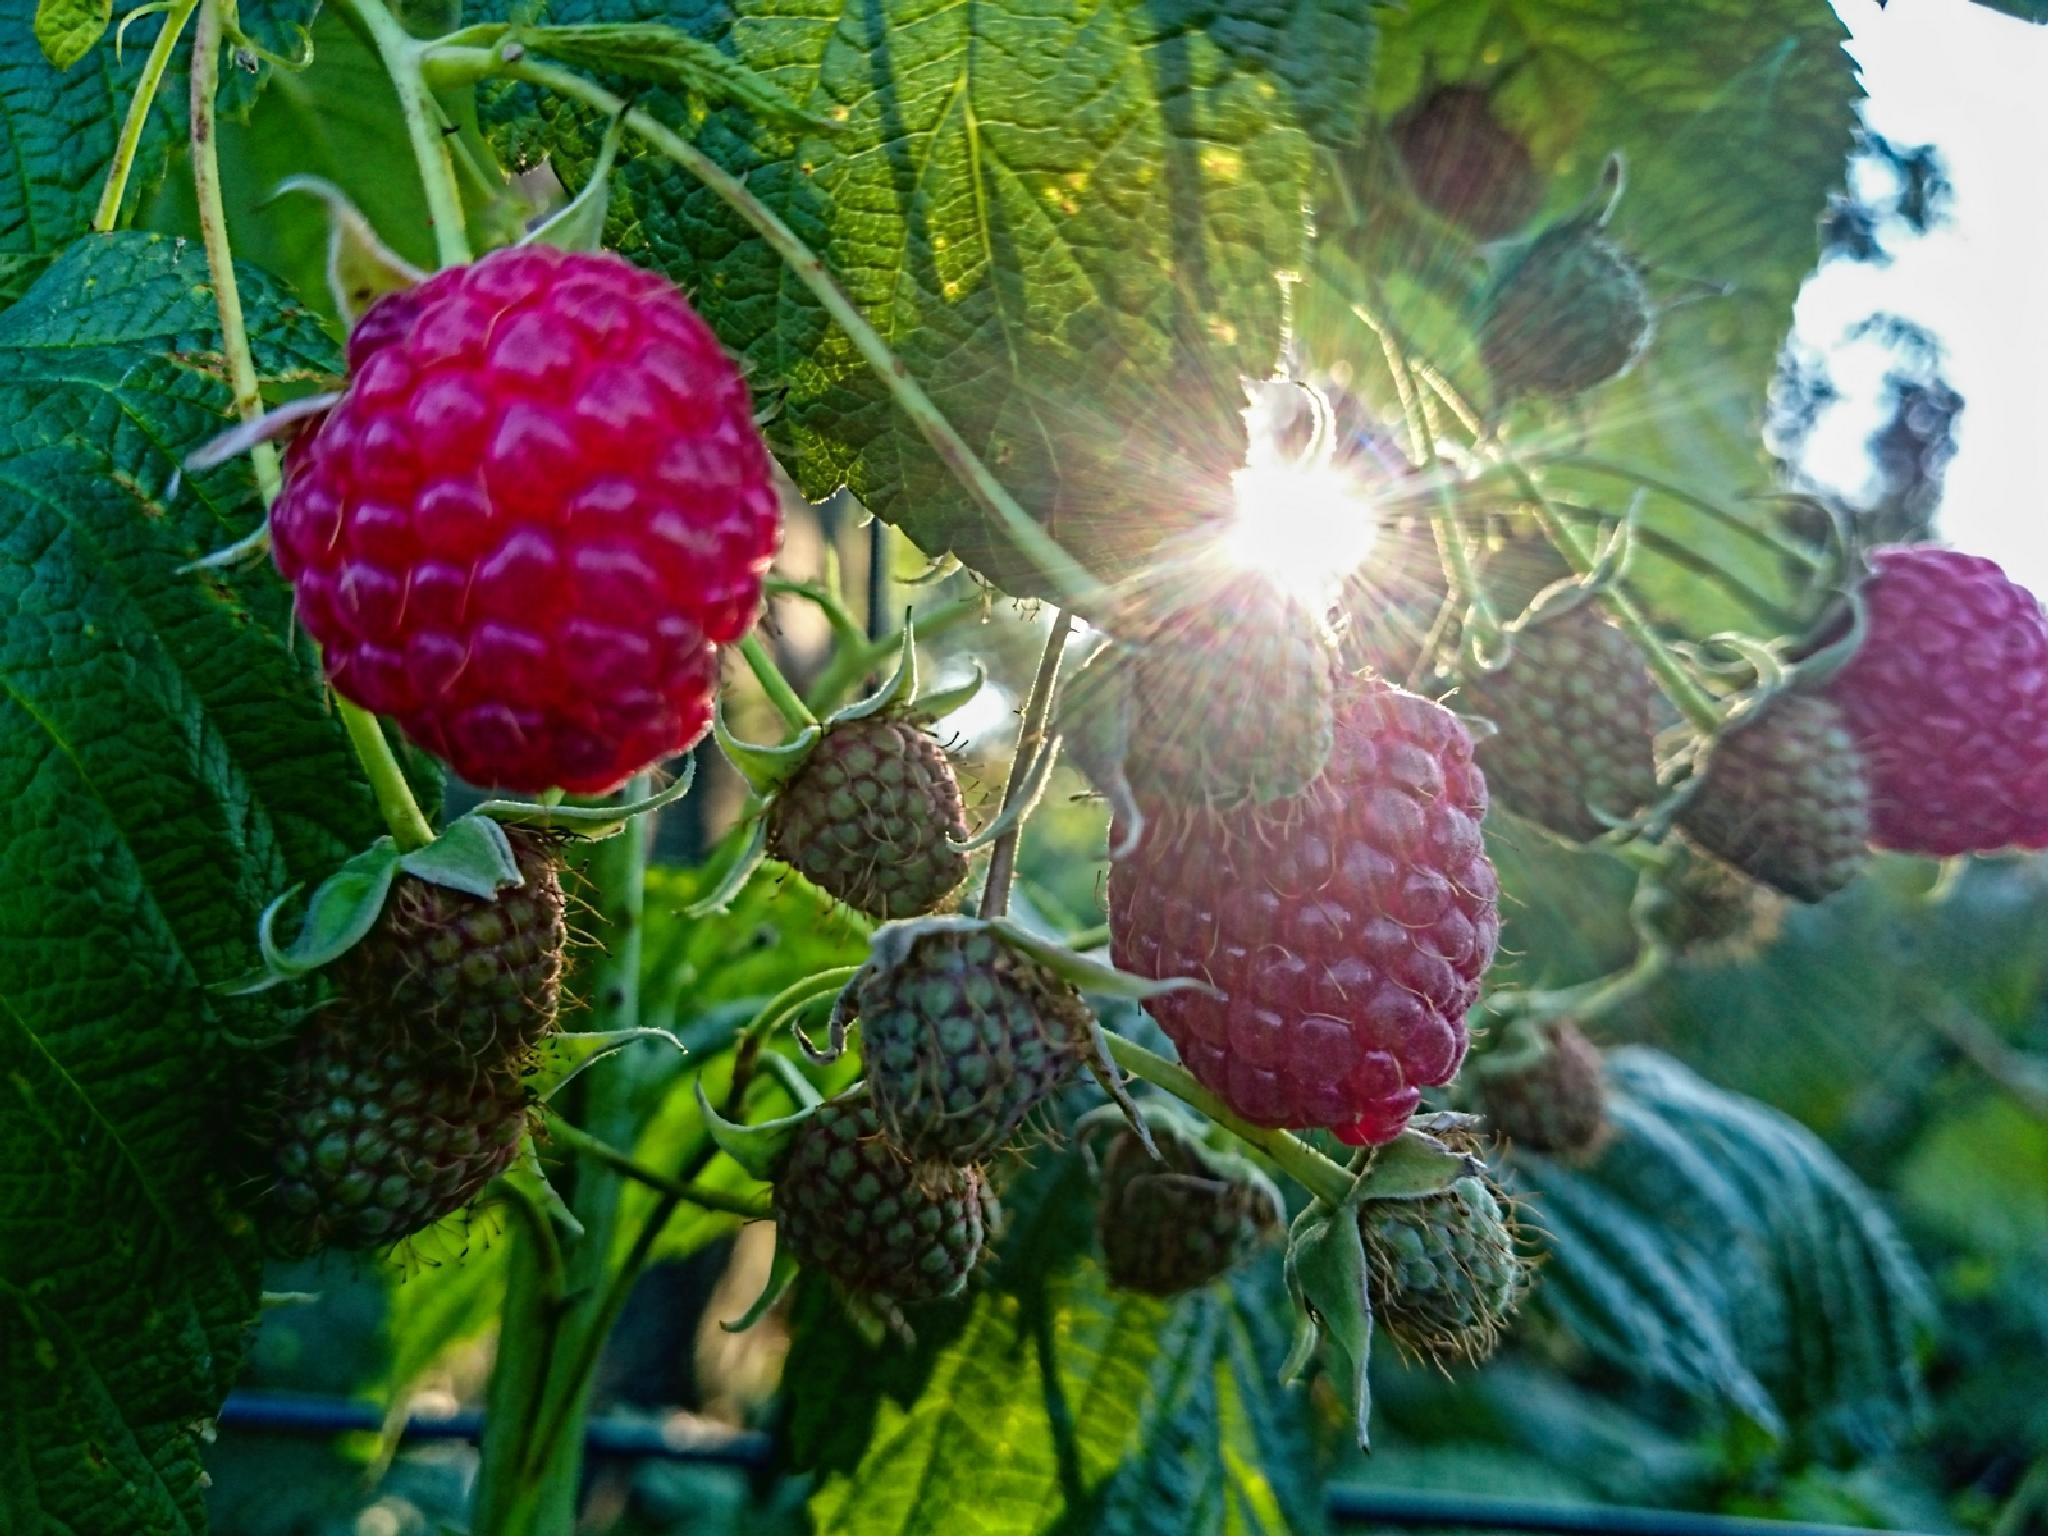 Raspberries in the sun by Waldemar Sadlowski